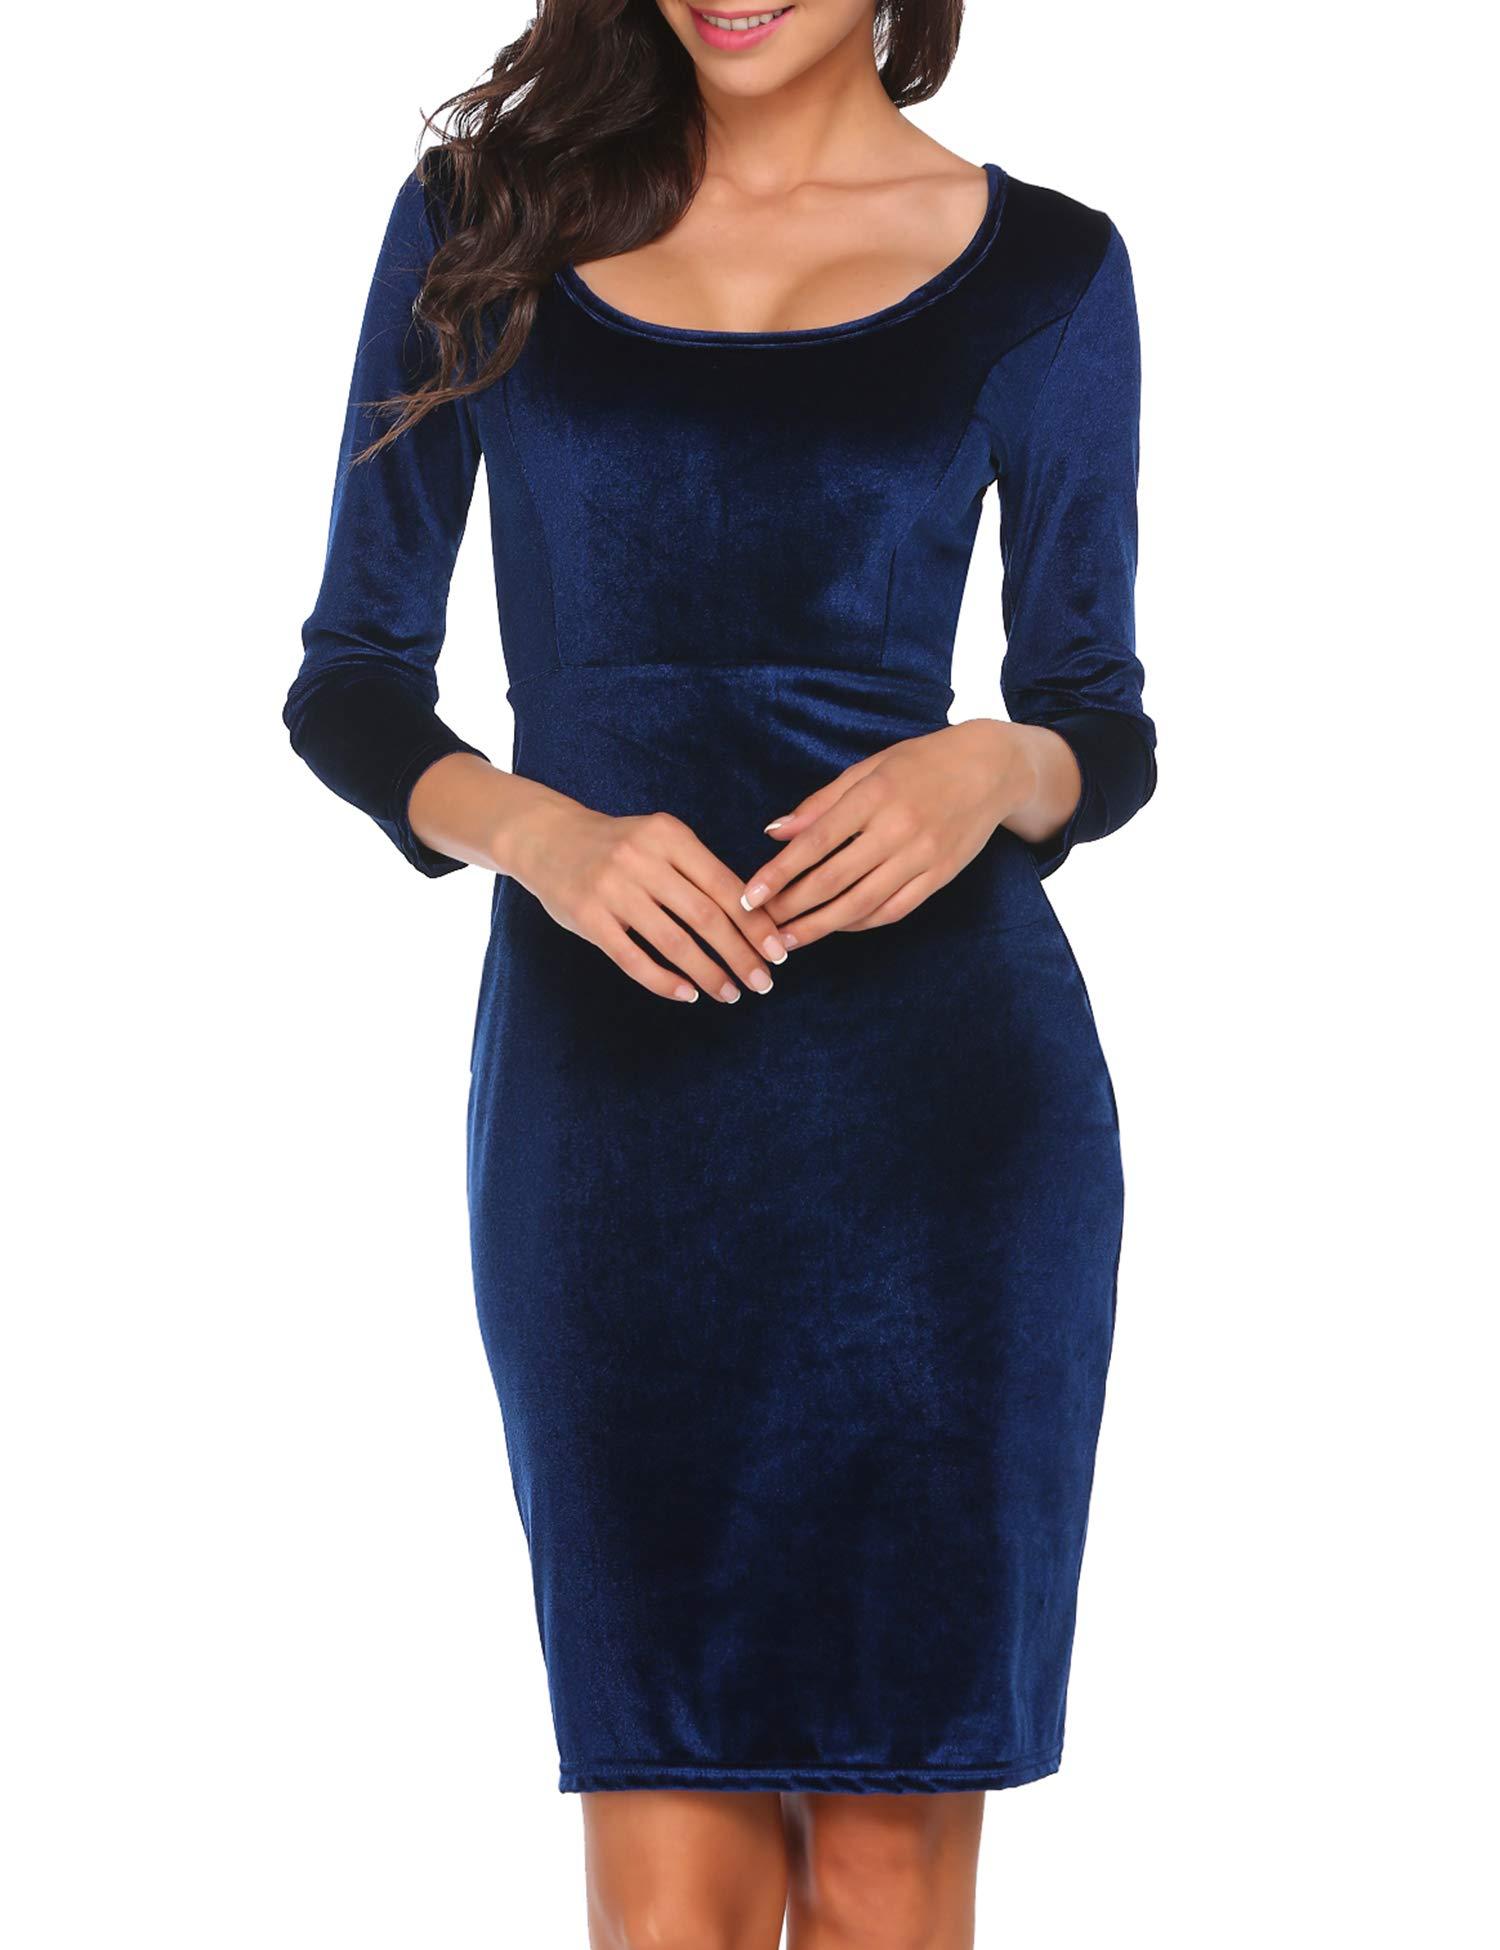 23f3df0e781 ACEVOG Women s Velvet 3 4 Sleeve Bodycon Pencil Vintage Dress Navy Blue